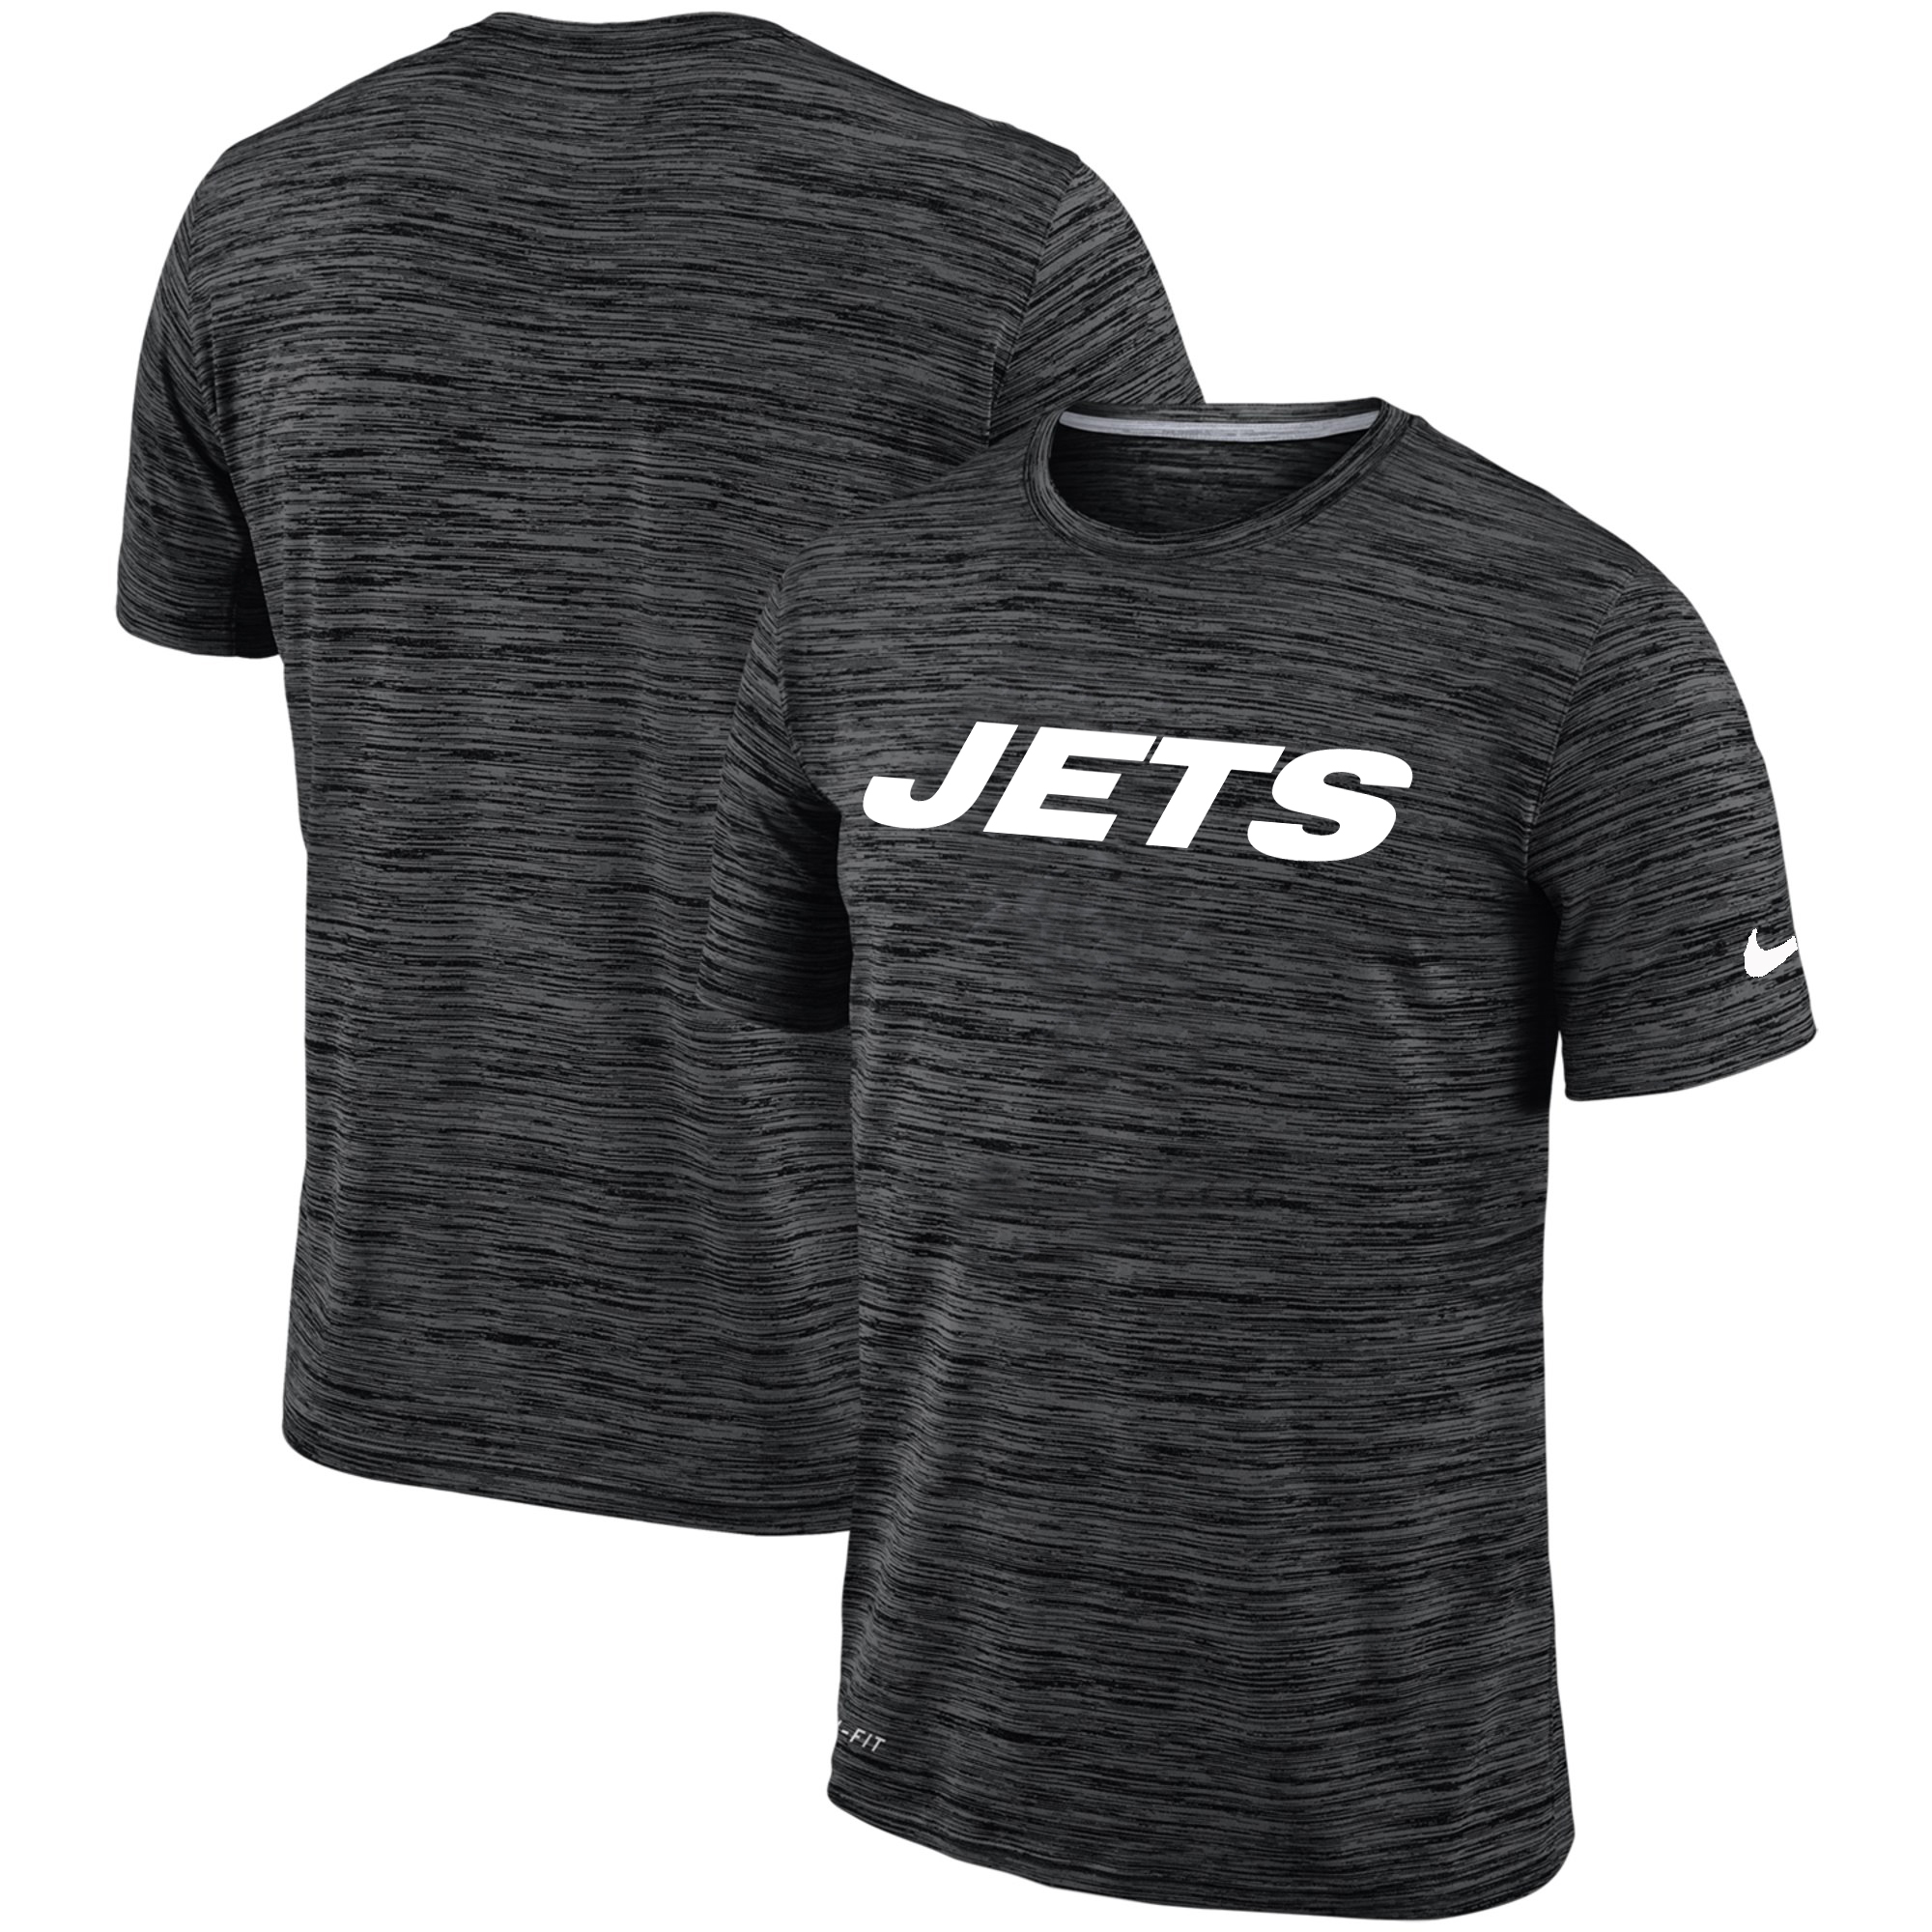 Men's New York Jets Nike Black Velocity Performance T-Shirt